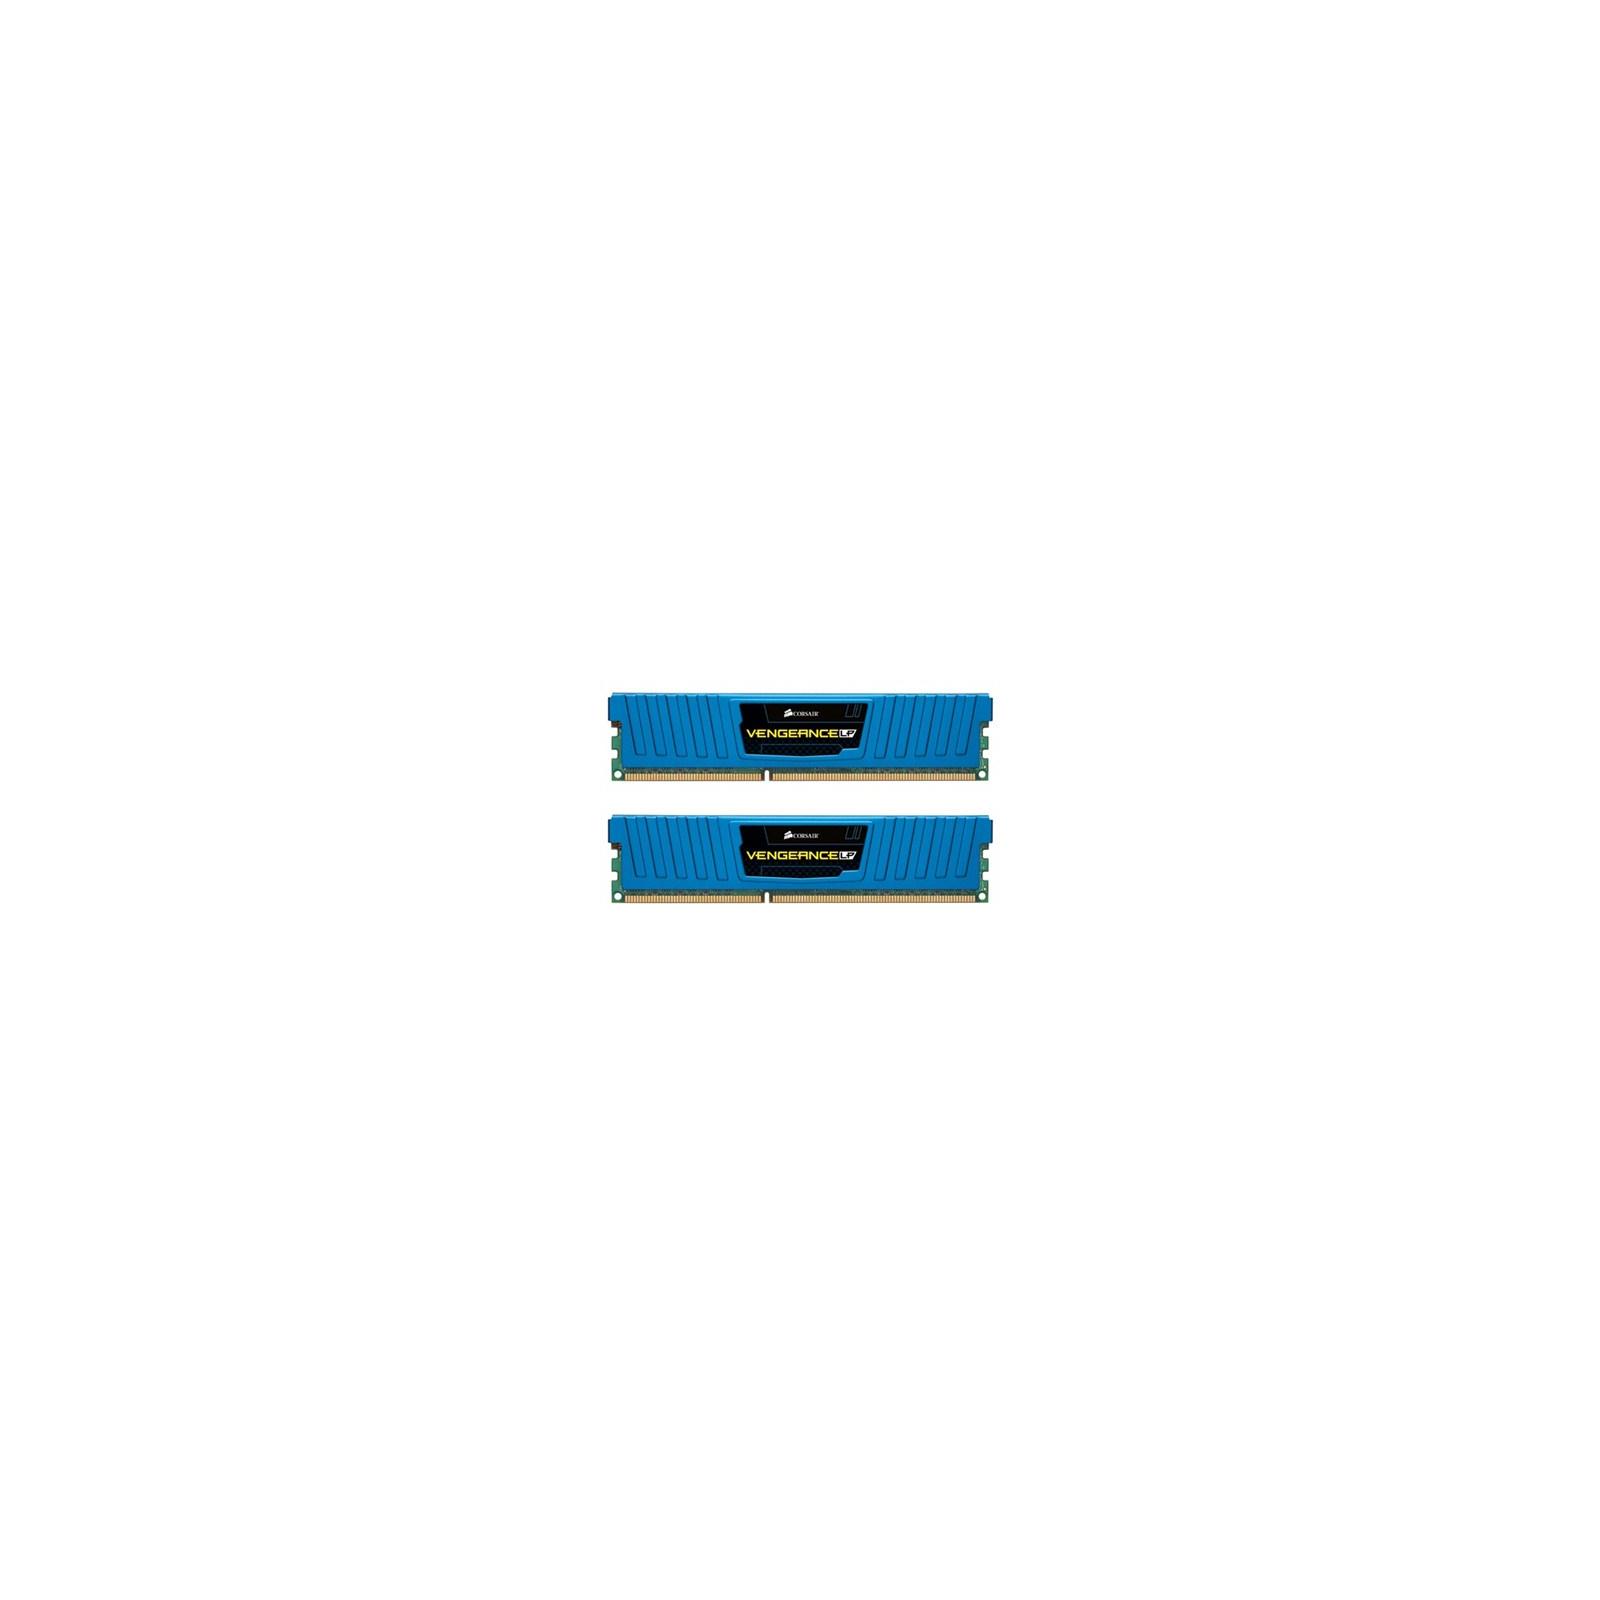 Модуль памяти для компьютера DDR3 8GB (2x4GB) 2133 MHz CORSAIR (CML8GX3M2A2133C11B)